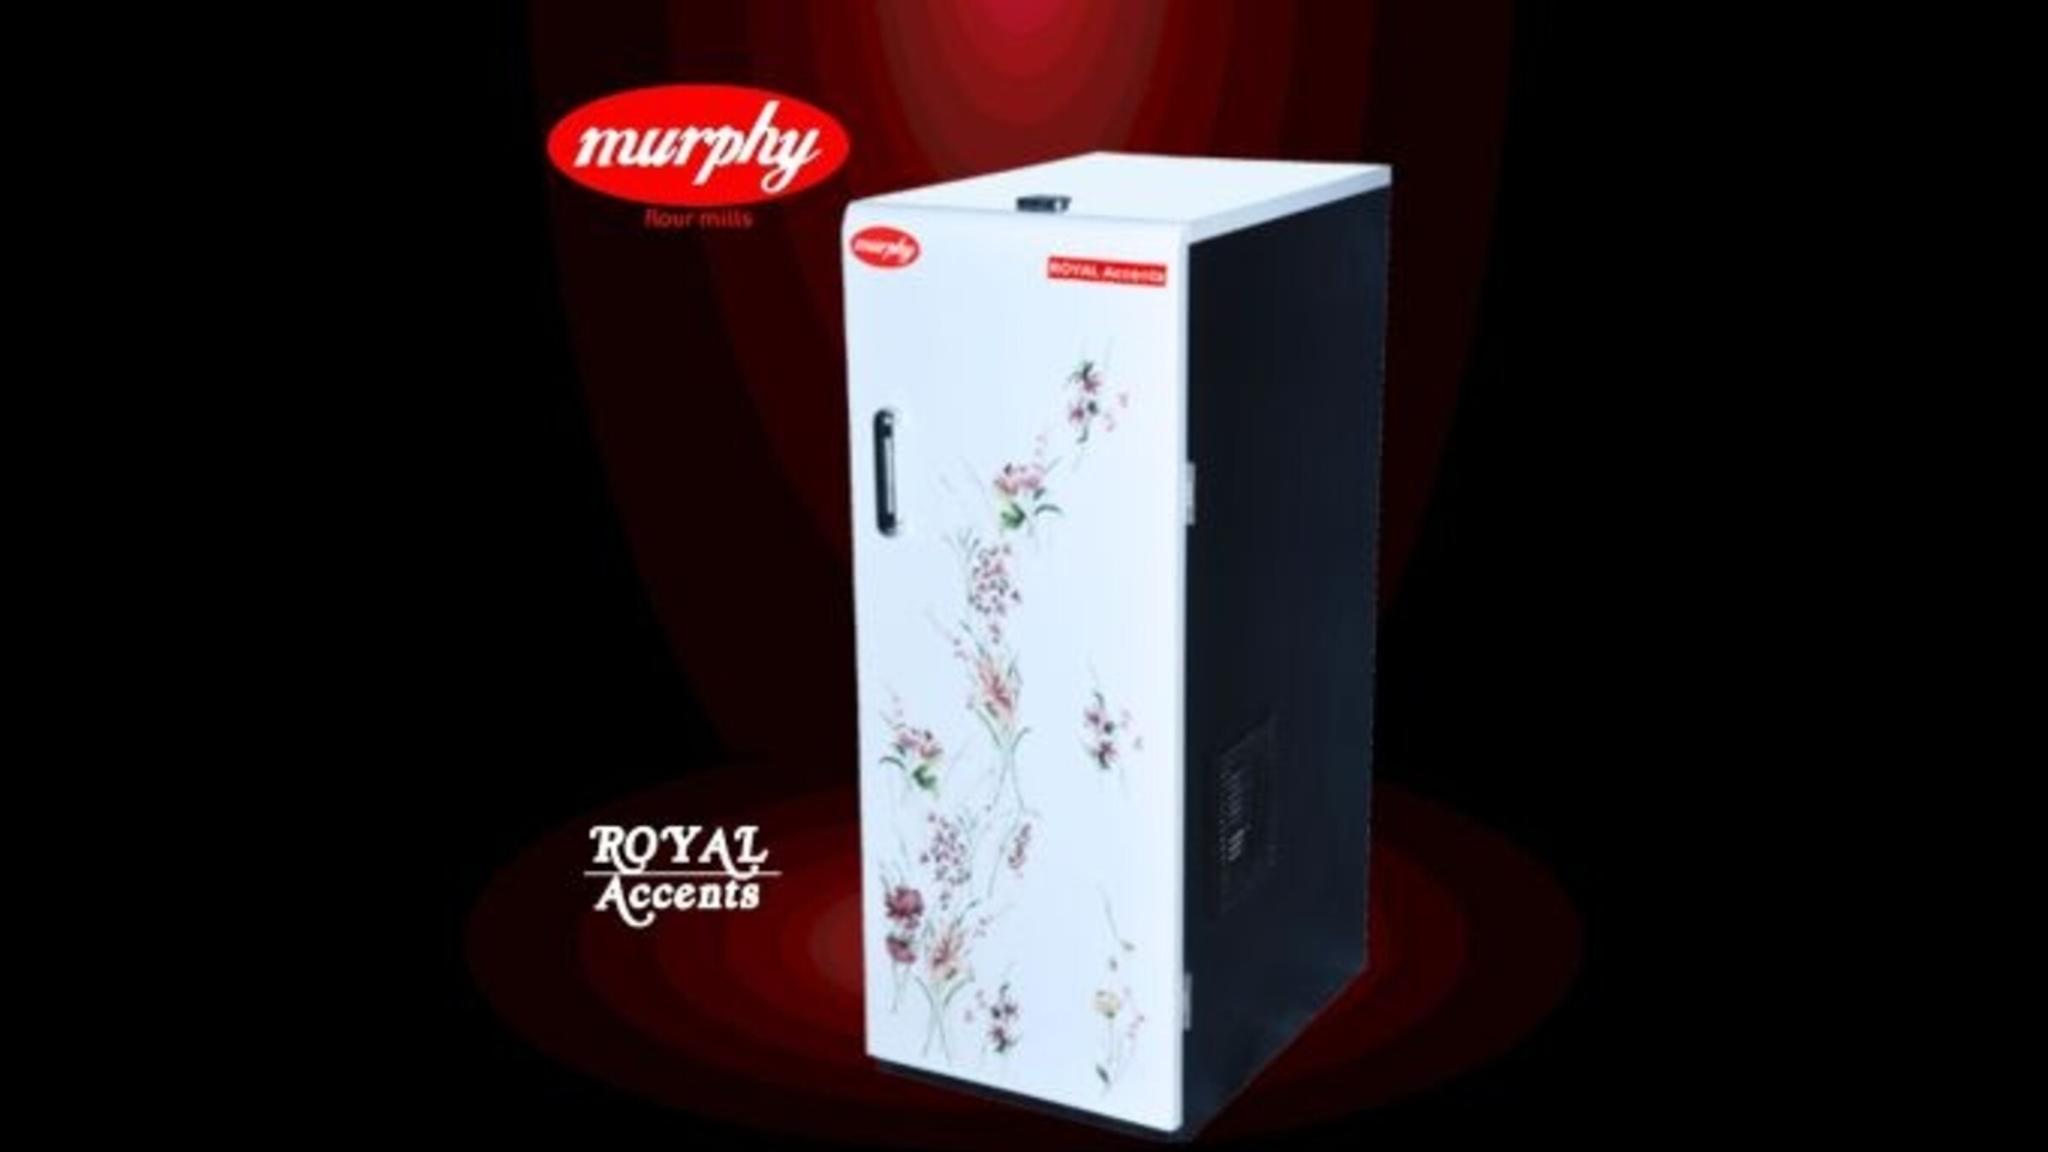 Manufacturer of Atta Chakki, Machine - Atta Maker offered by Murphy Industries, Ahmedabad, Gujarat.